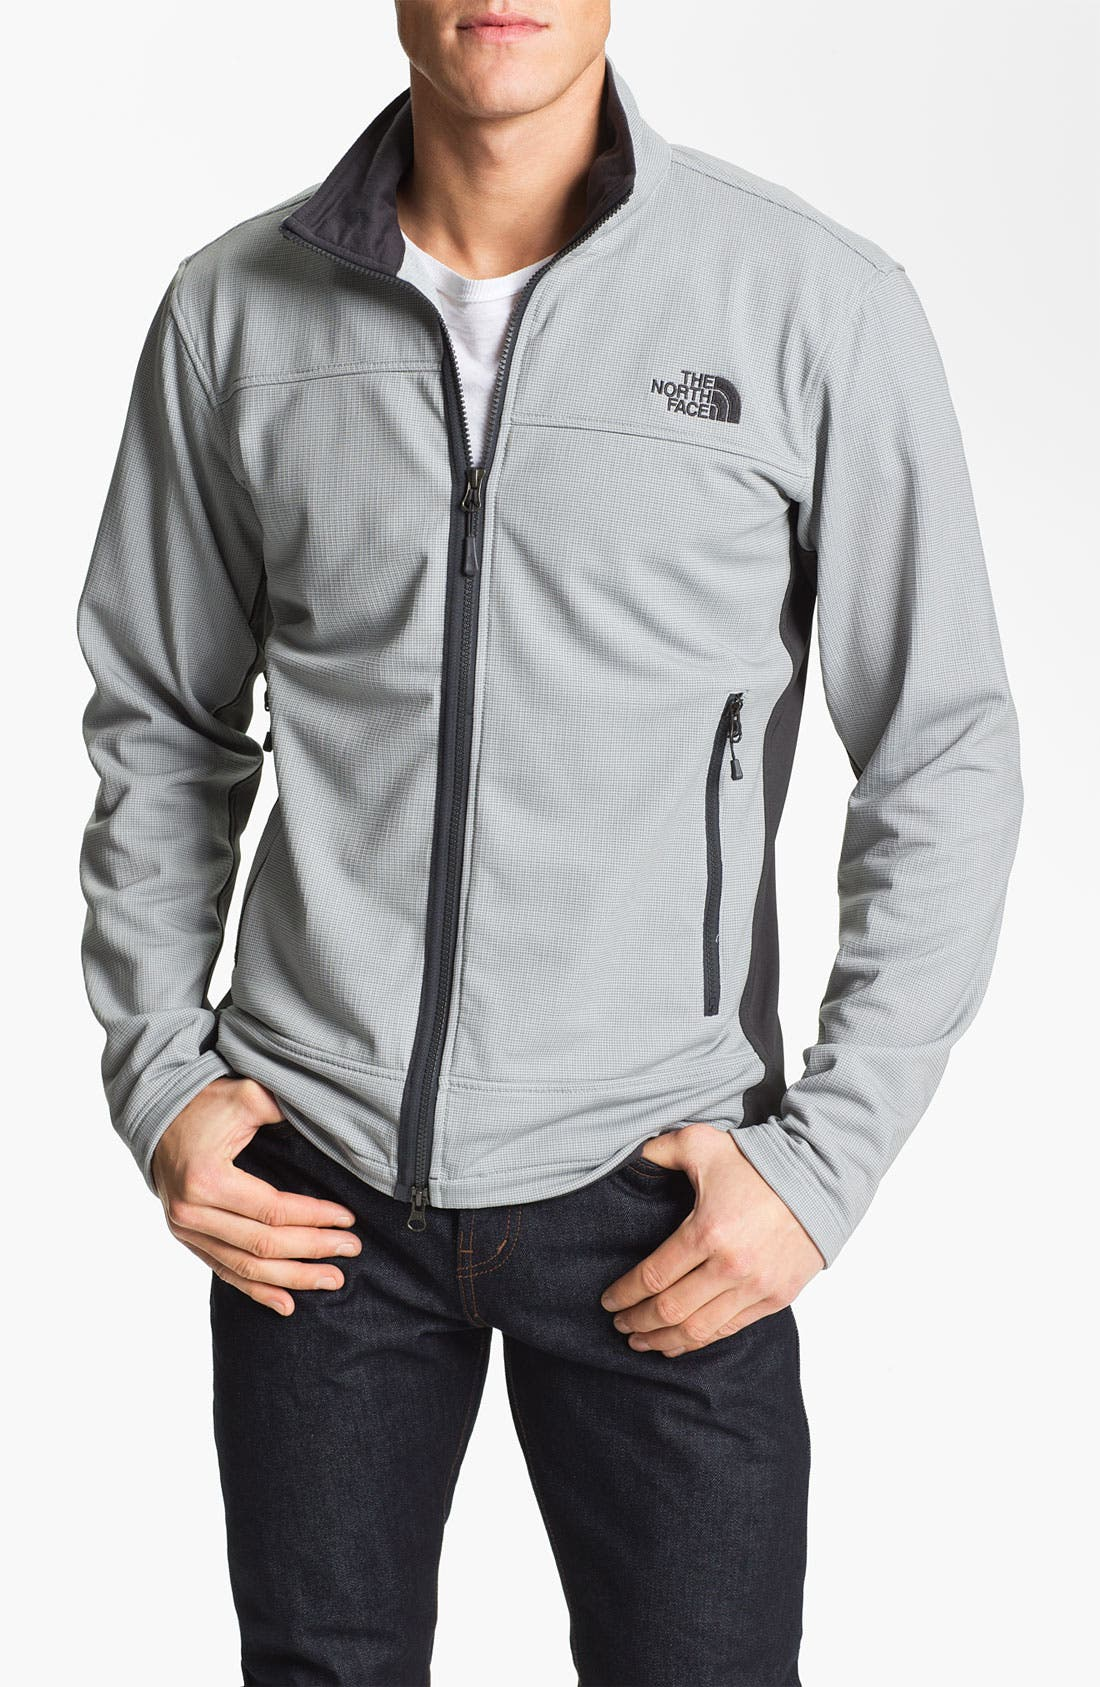 Main Image - The North Face 'Honed' Jacket